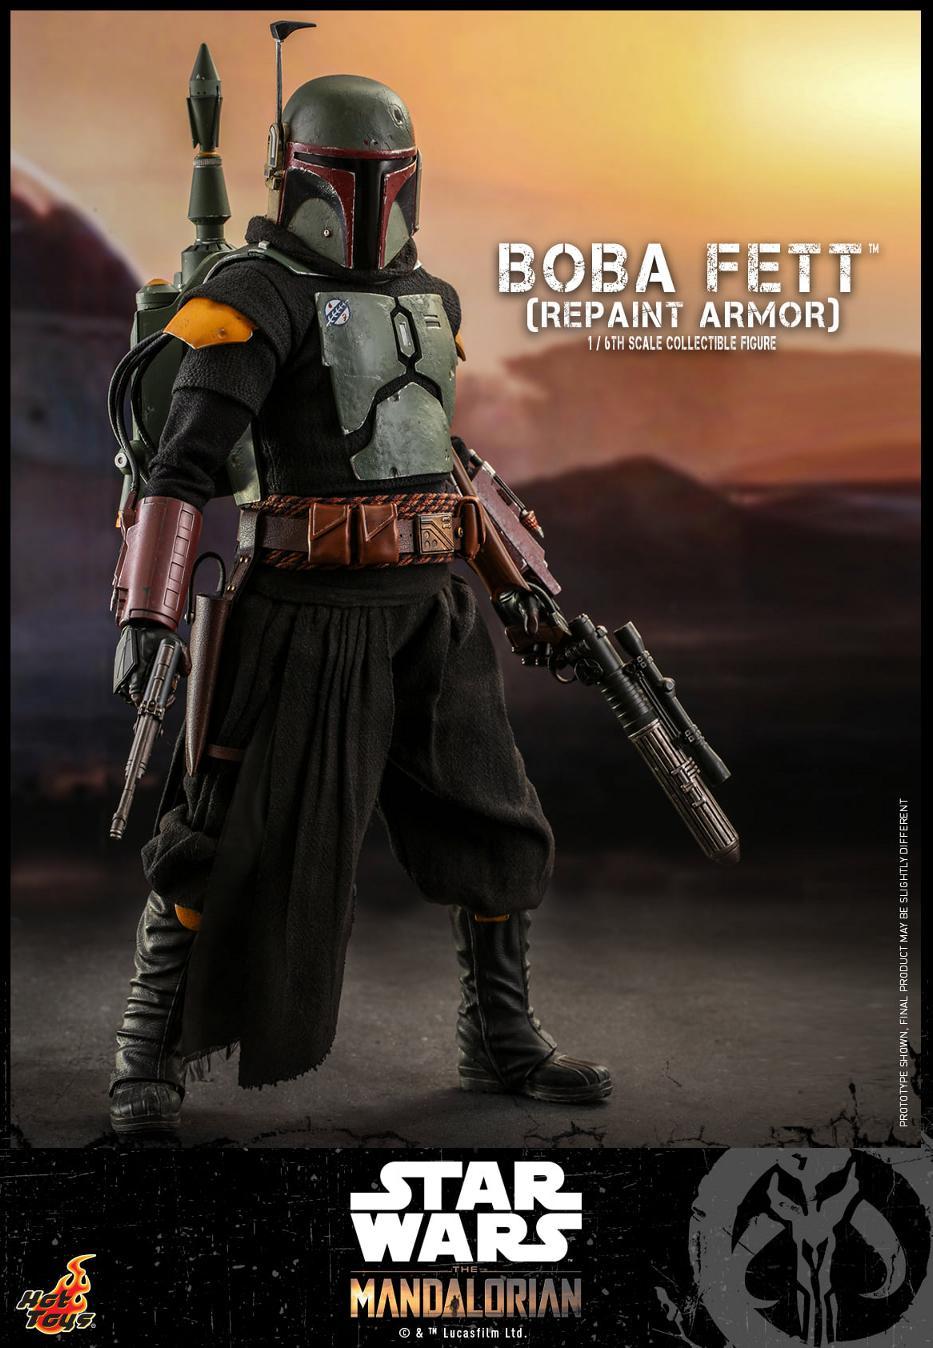 Boba Fett (Repaint Armor) Collectible Figure - Hot Toys Boba_f62